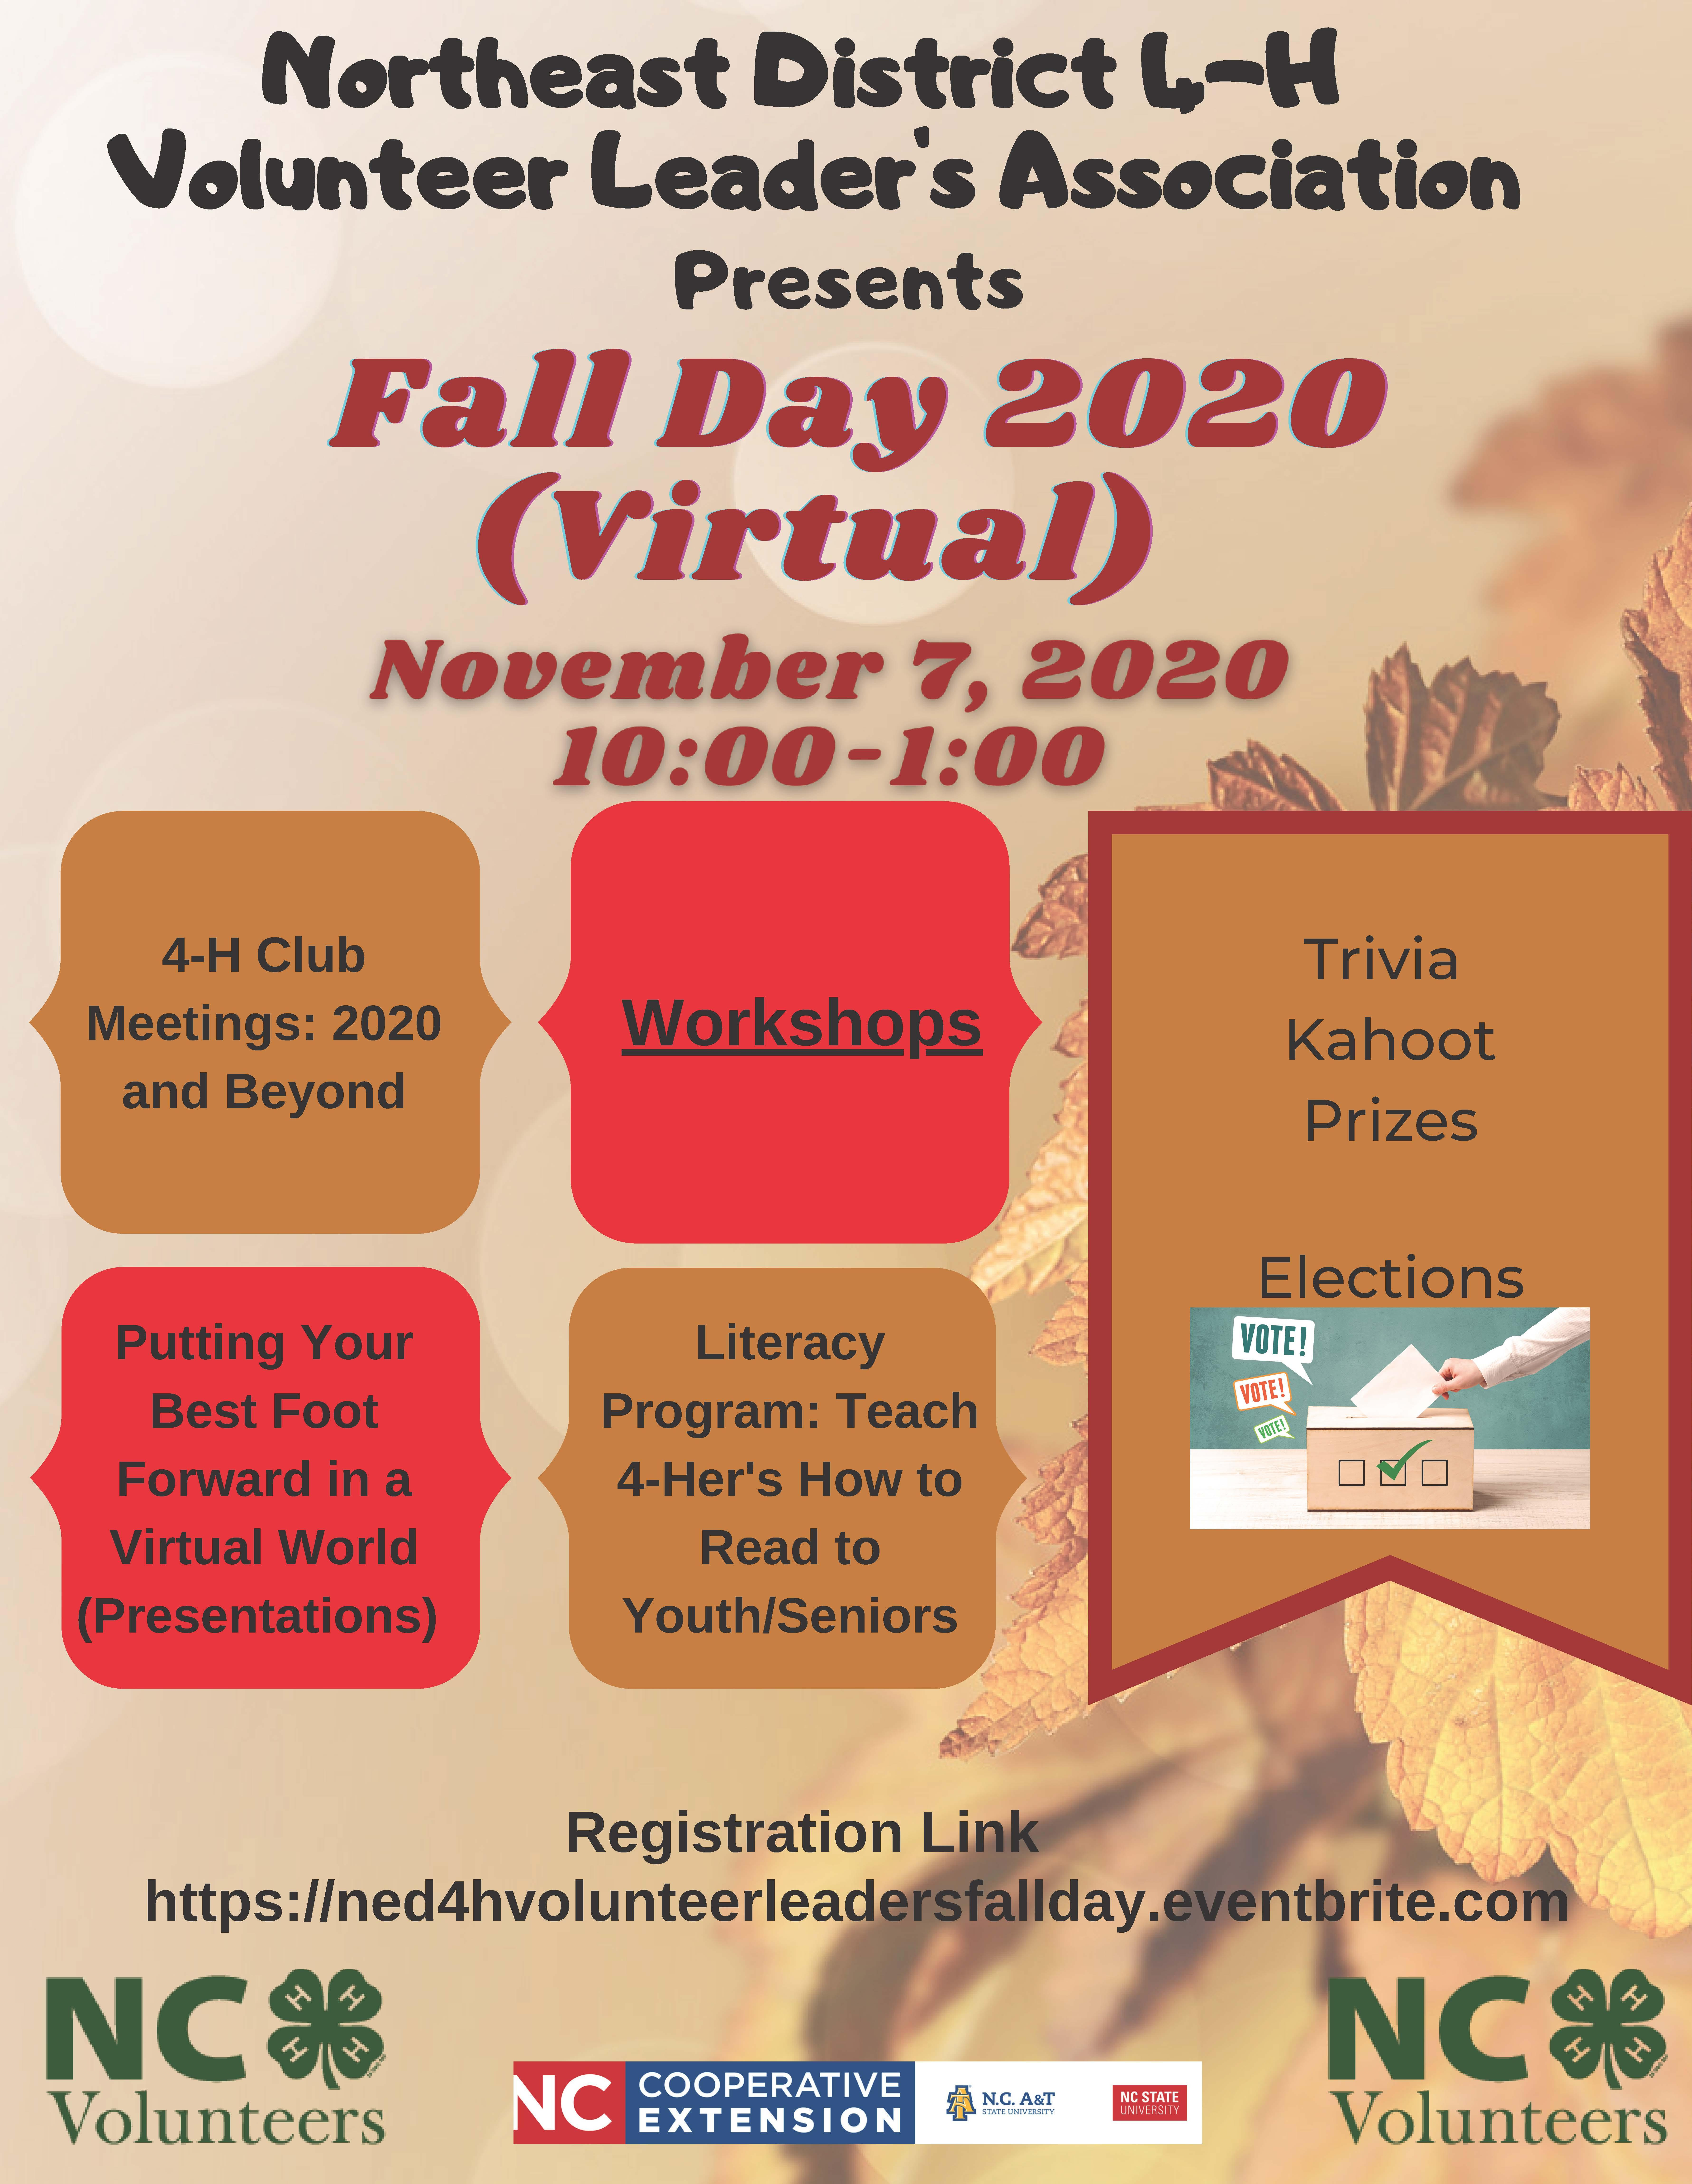 Fall Day 2020